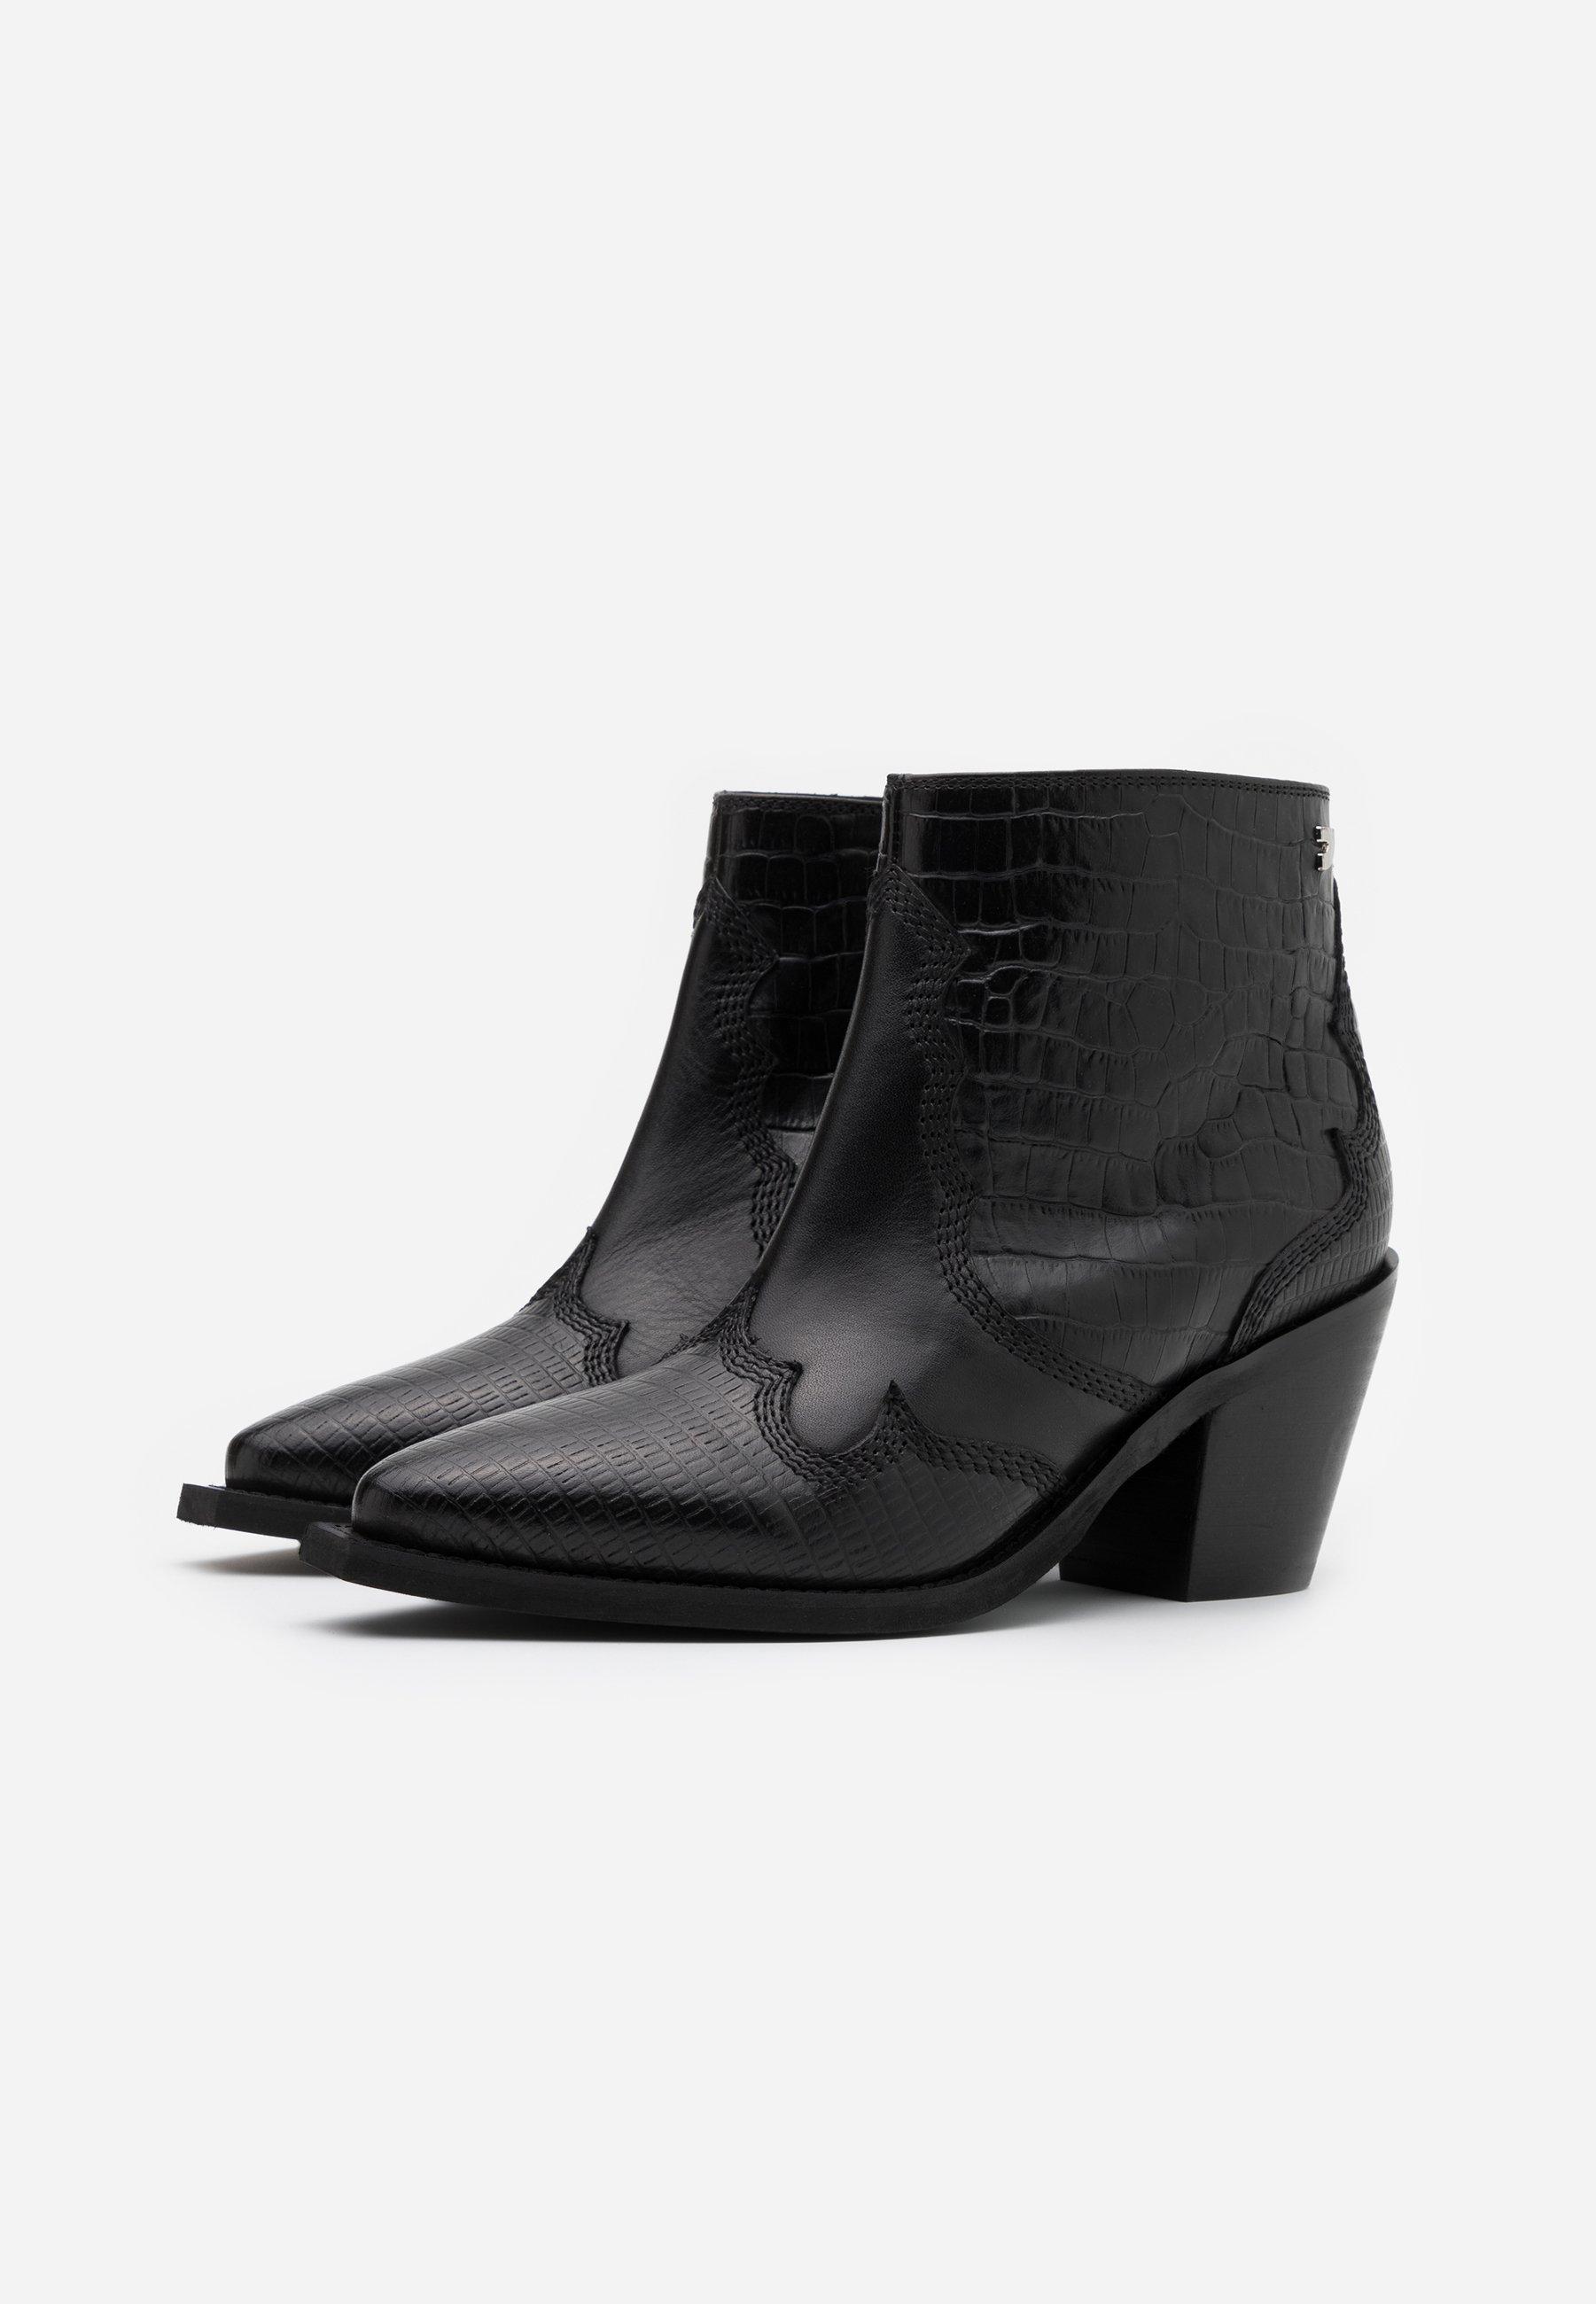 Gioseppo RENCHEN - Ankle Boot - black | Damen Schuhe 2020